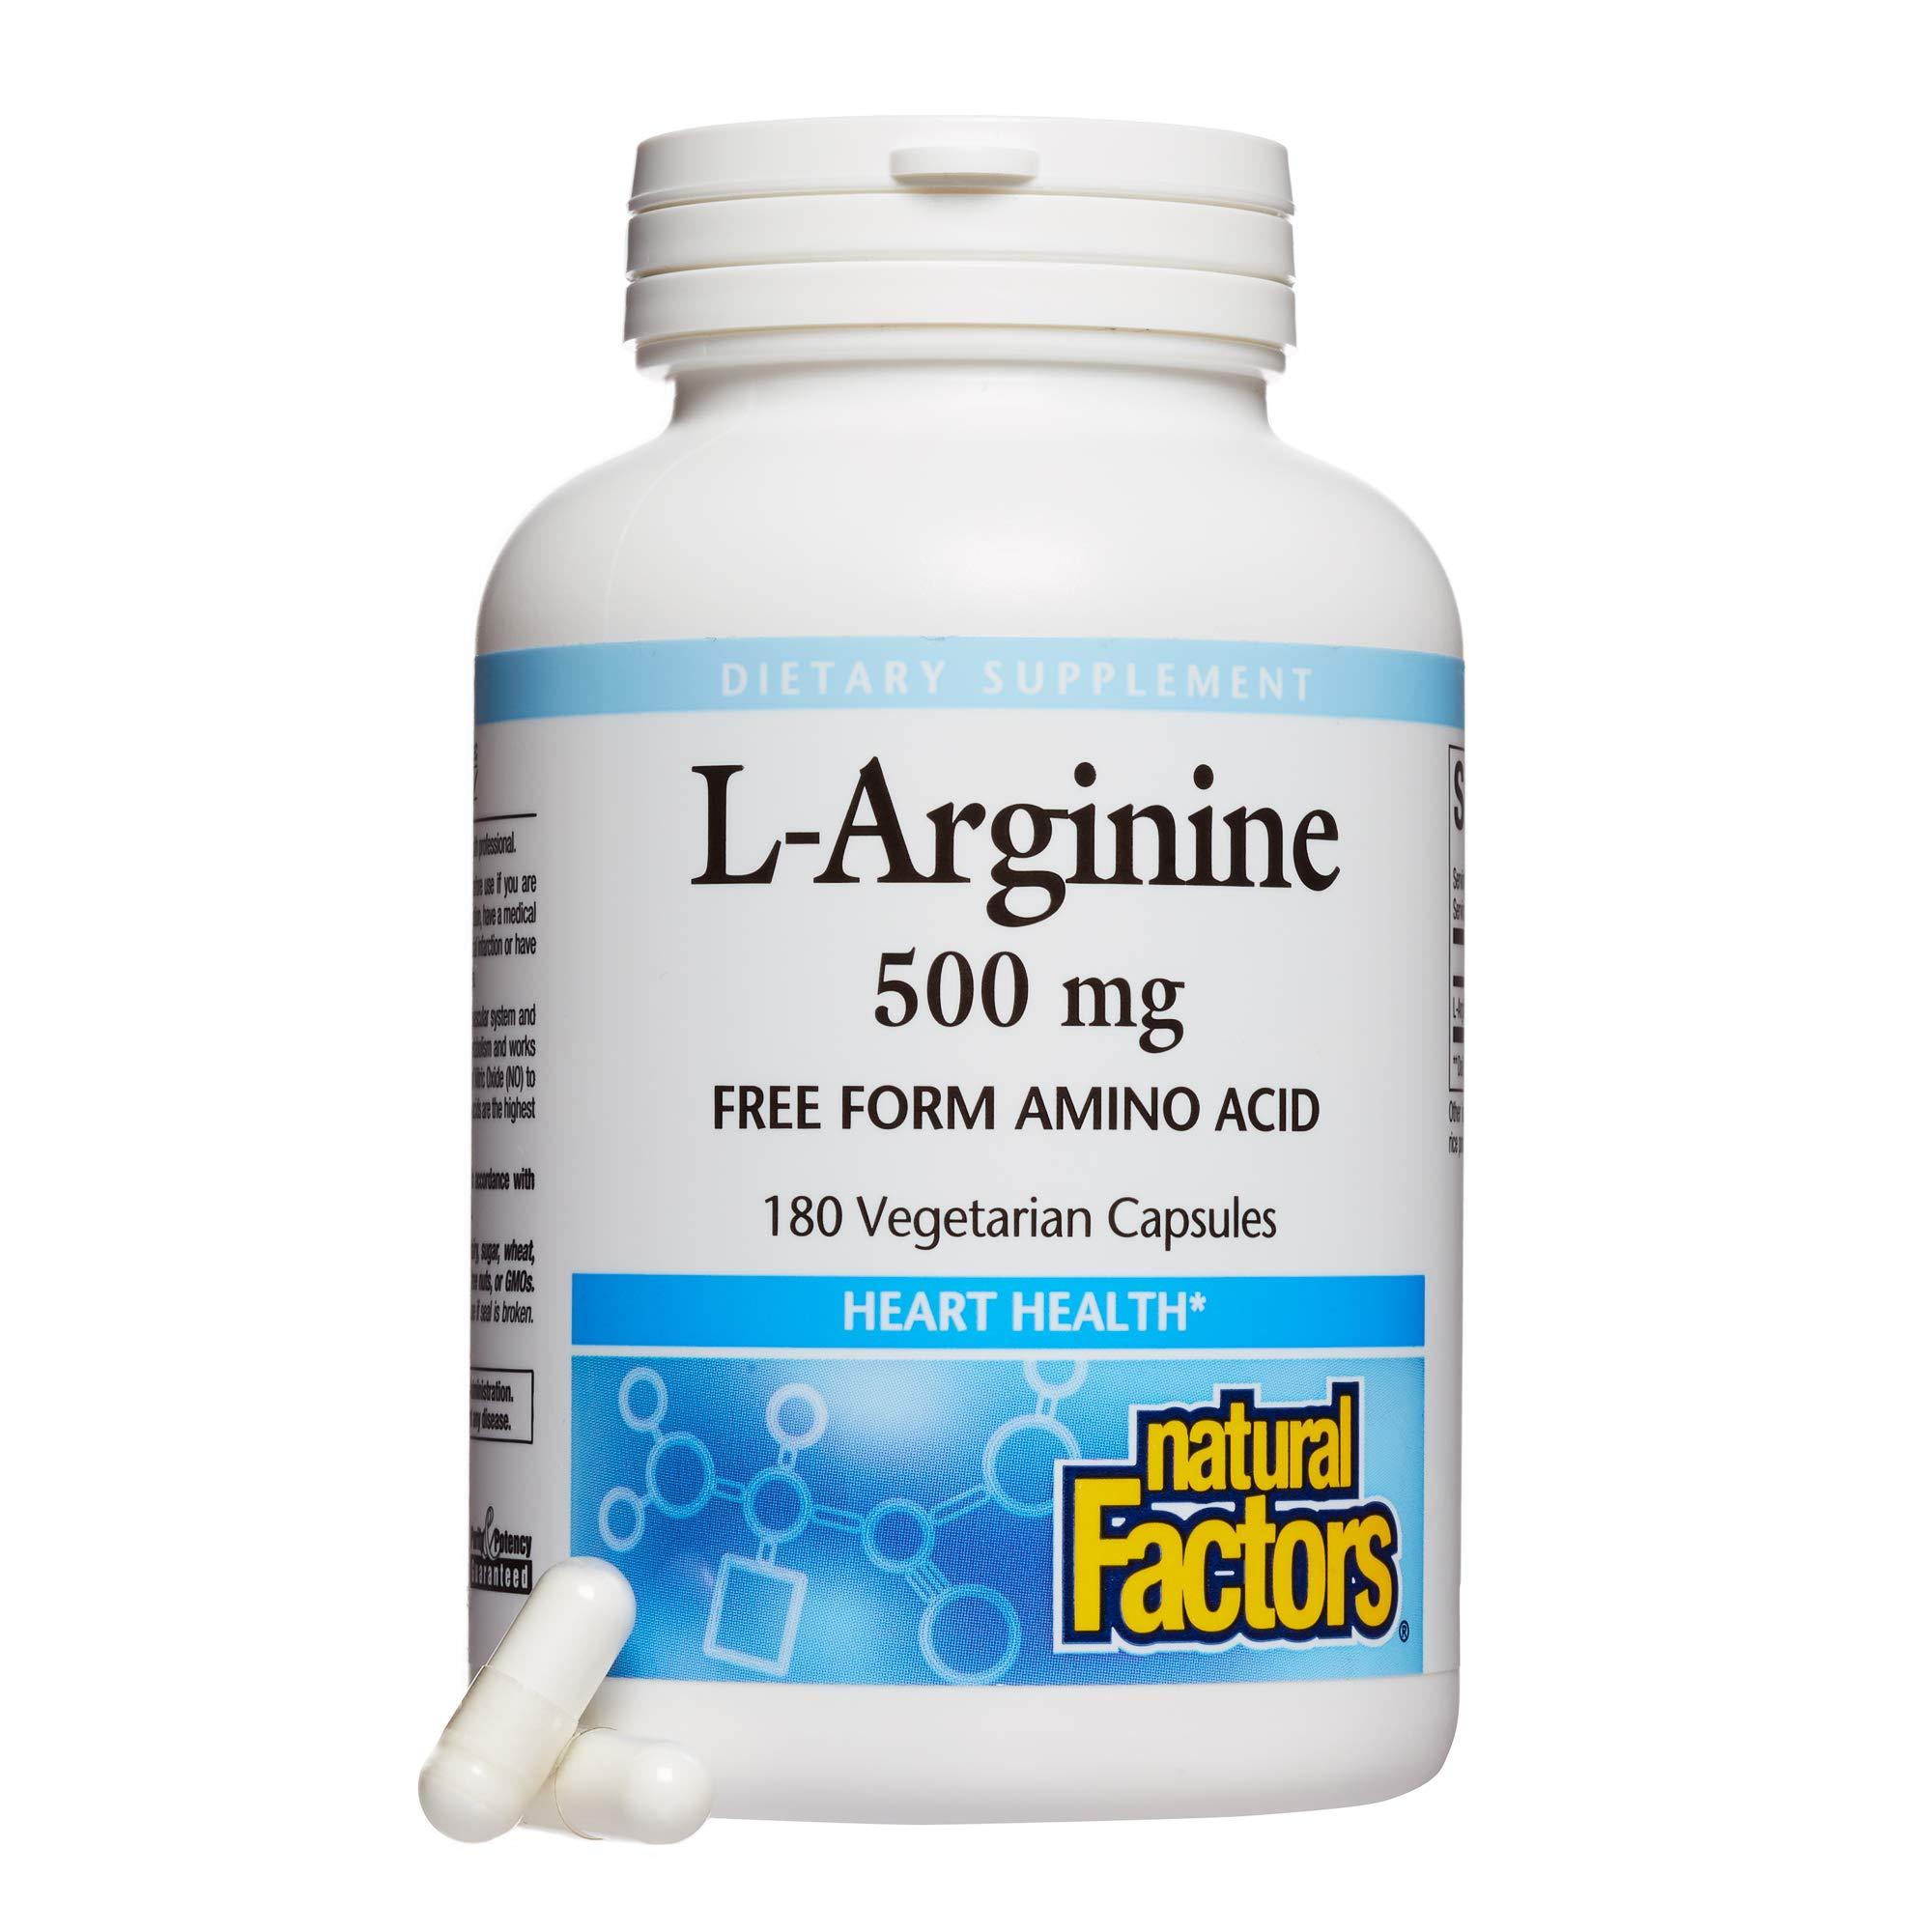 Natural Factors - L-Arginine, Supports Muscle Metabolism, 180 Vegetarian Capsules